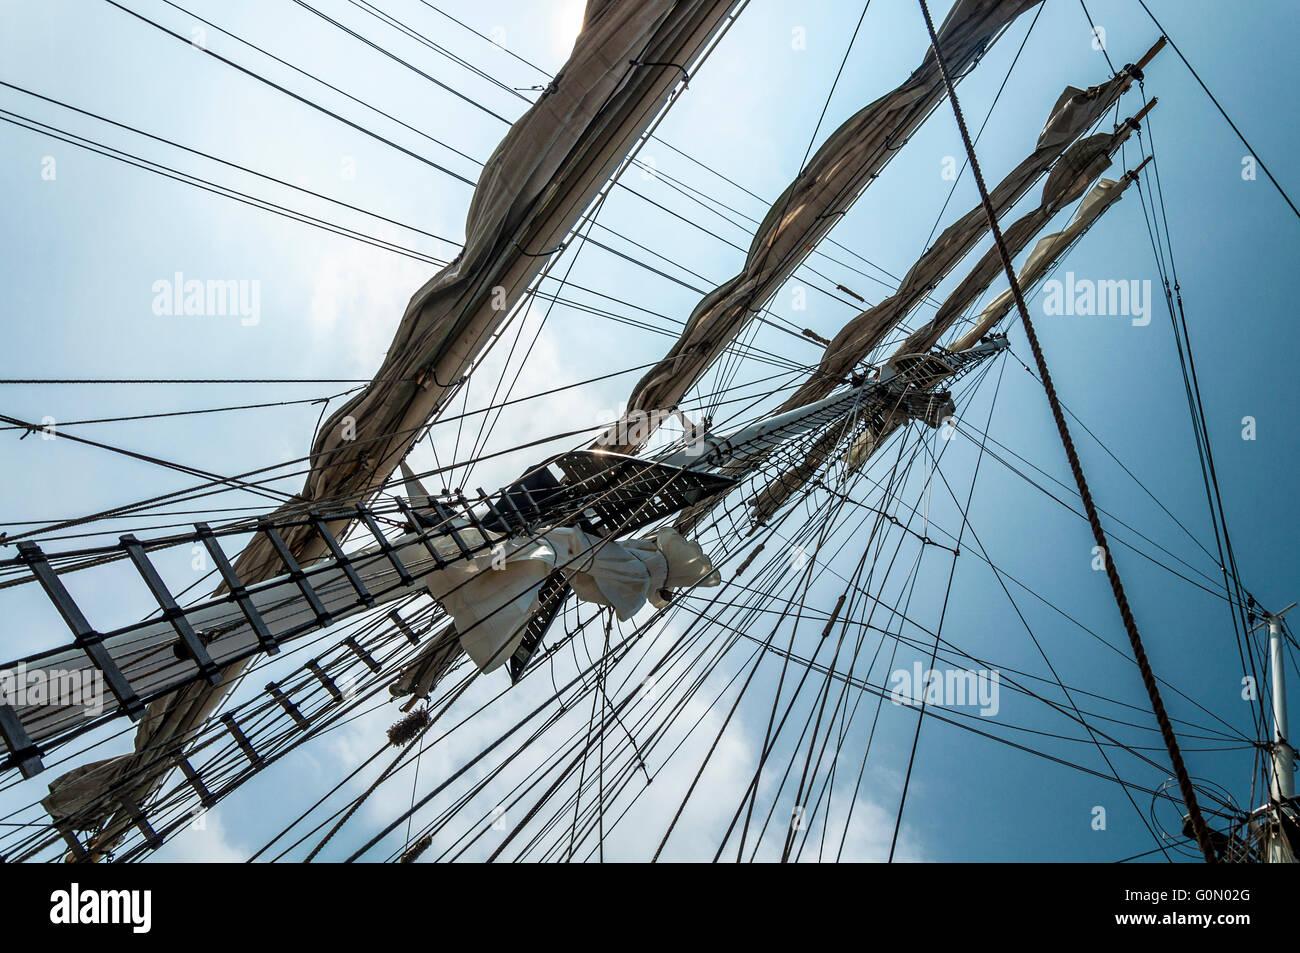 Tall sailing ship rigging patterns - Stock Image